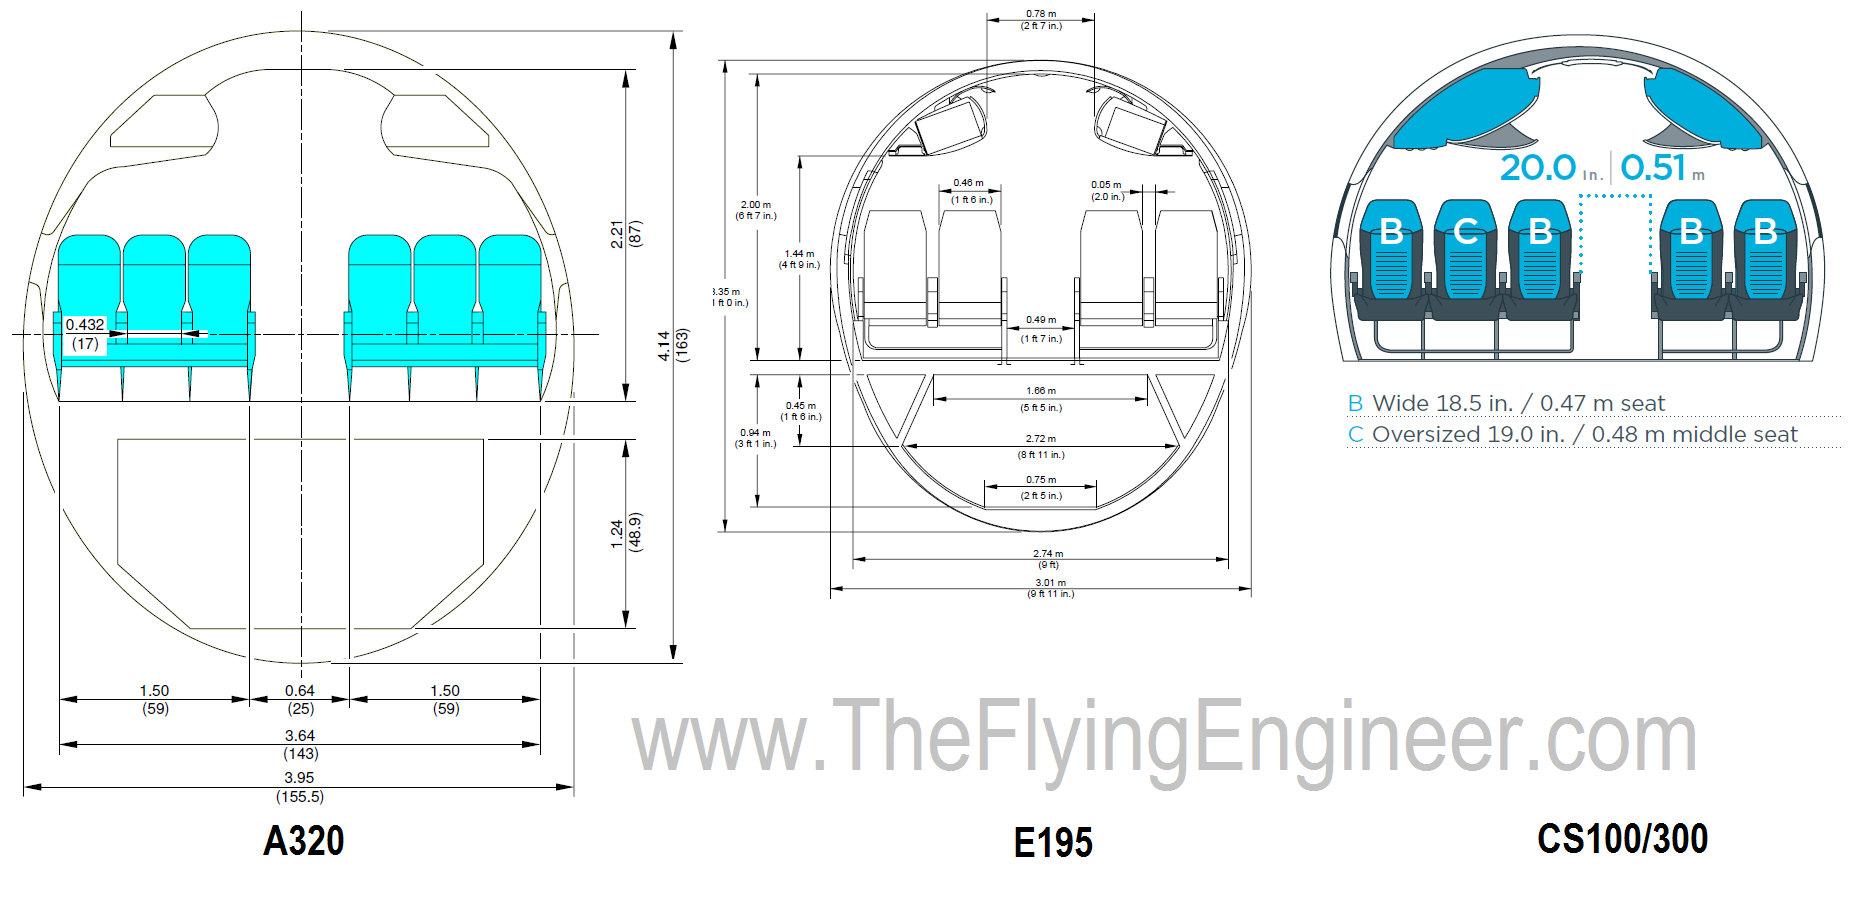 A320NEO Plus - Page 6 Seat_comparisons_a320_e195_cs100_3001